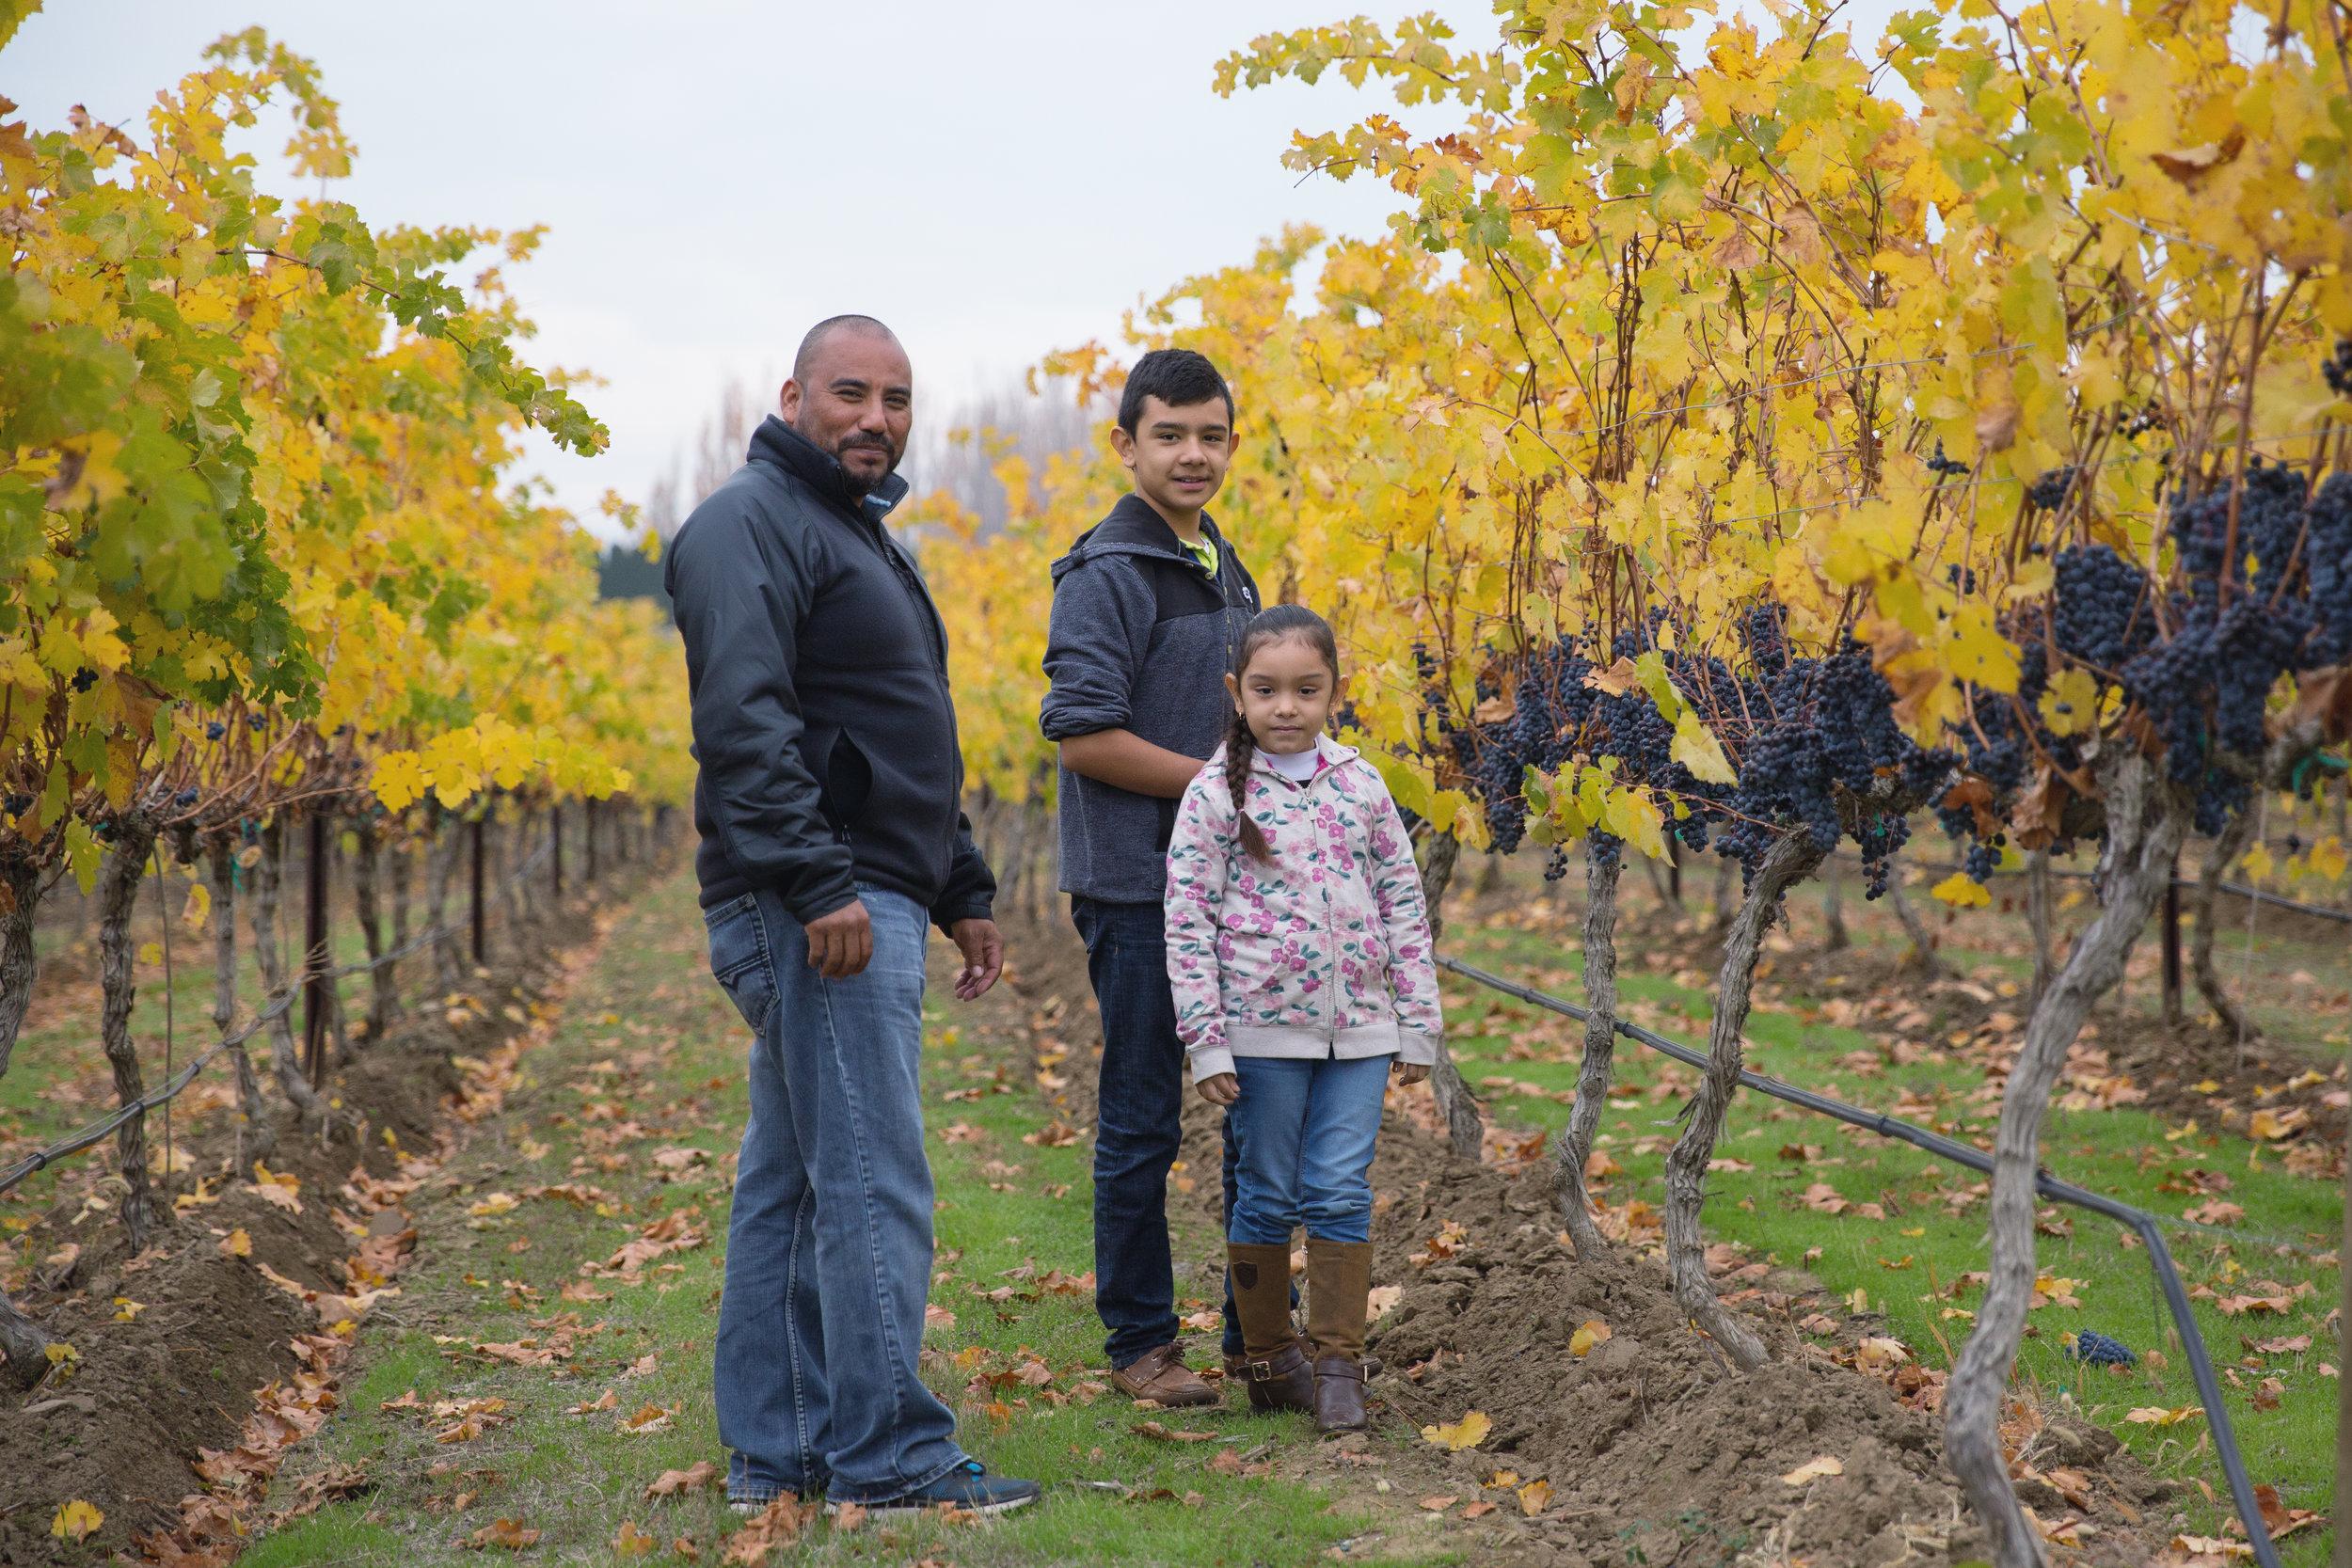 Eliceo Gil - Vineyard Foreman with his grandchildren